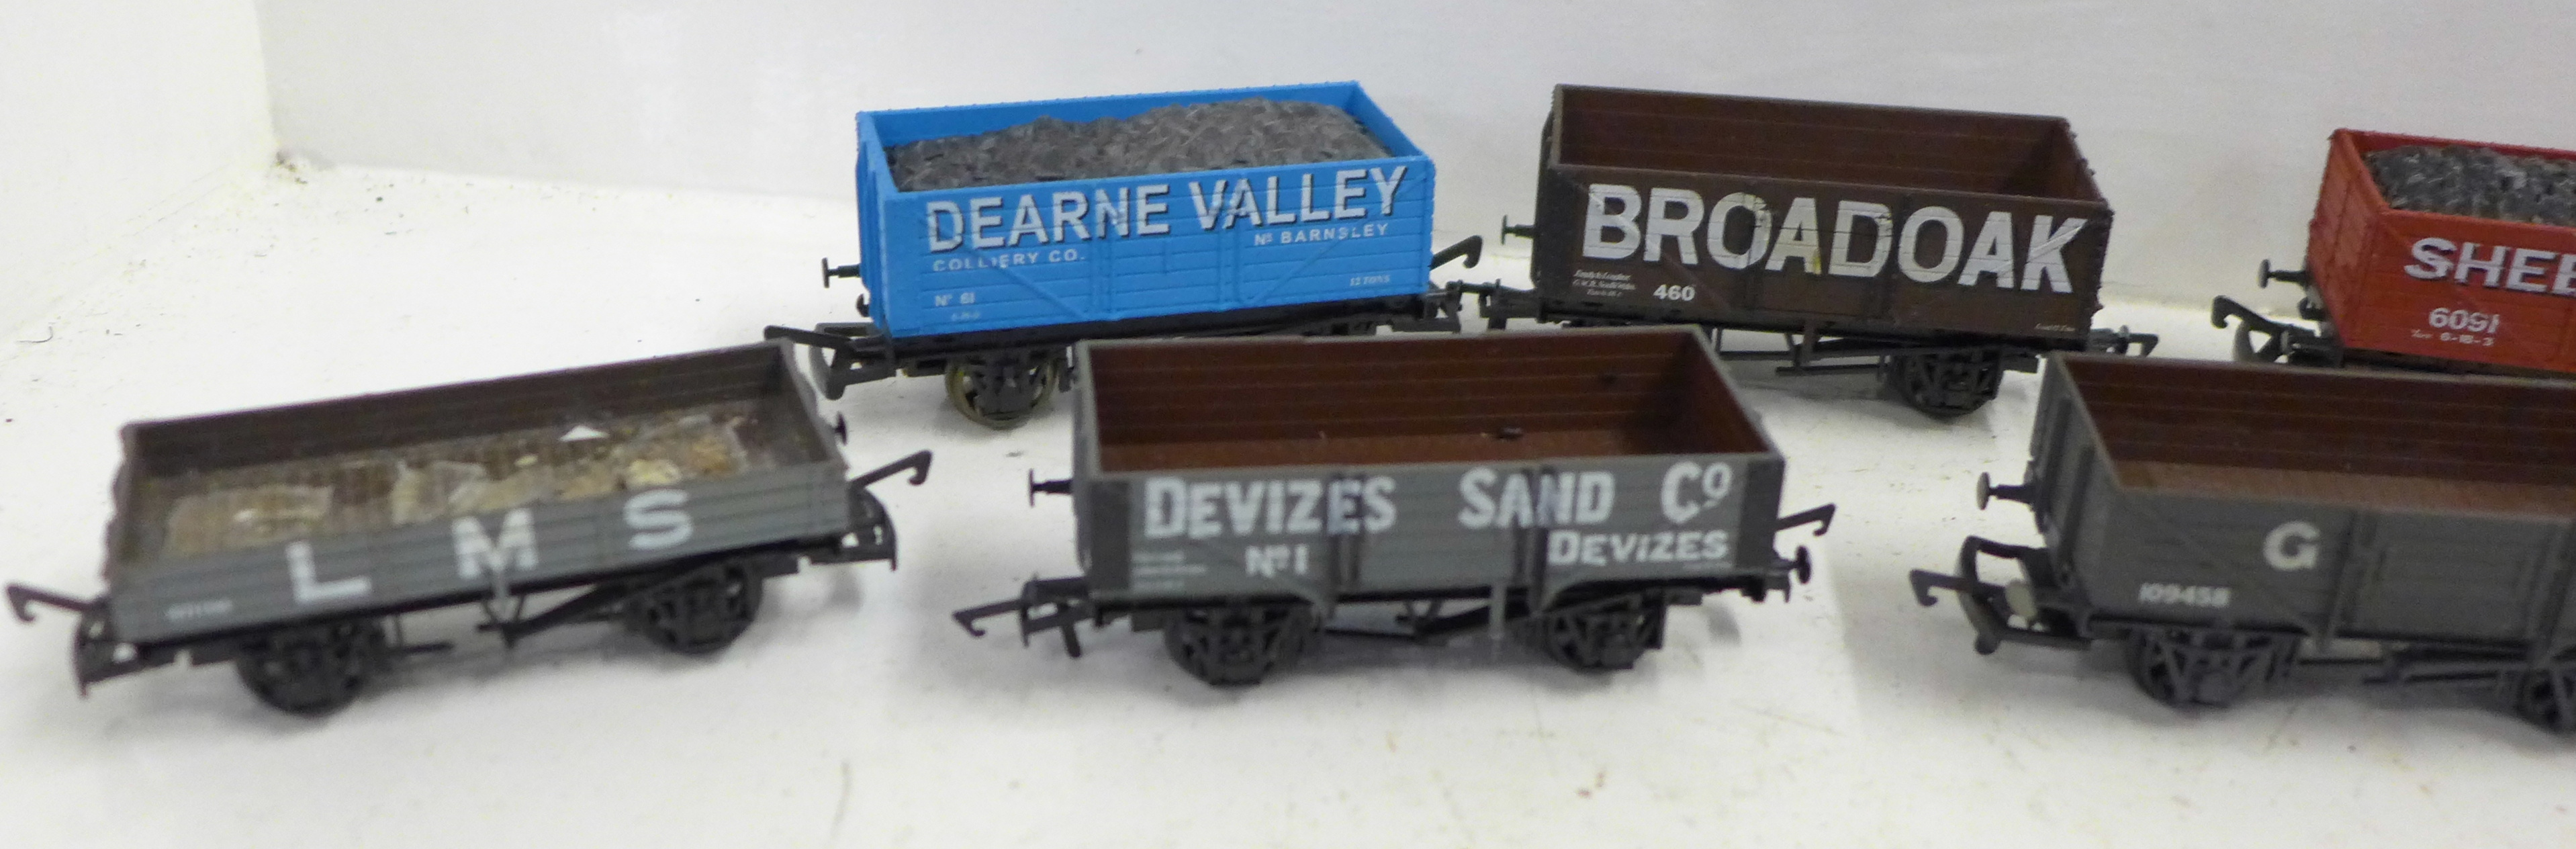 Ten OO gauge model railway wagons including Airfix and Dapol - Image 2 of 3